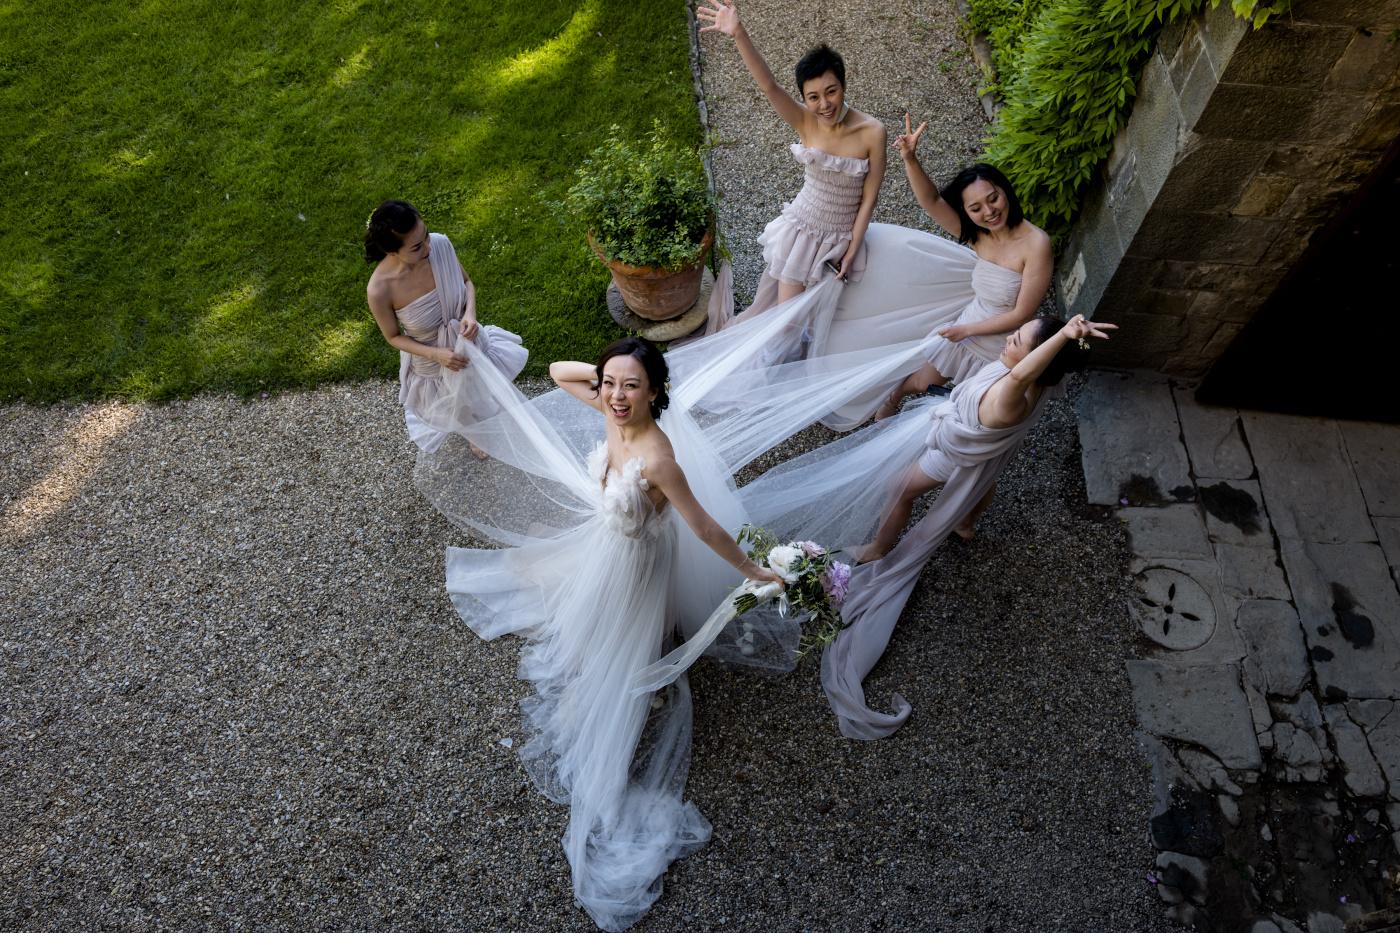 Bridal party with elegant dresses